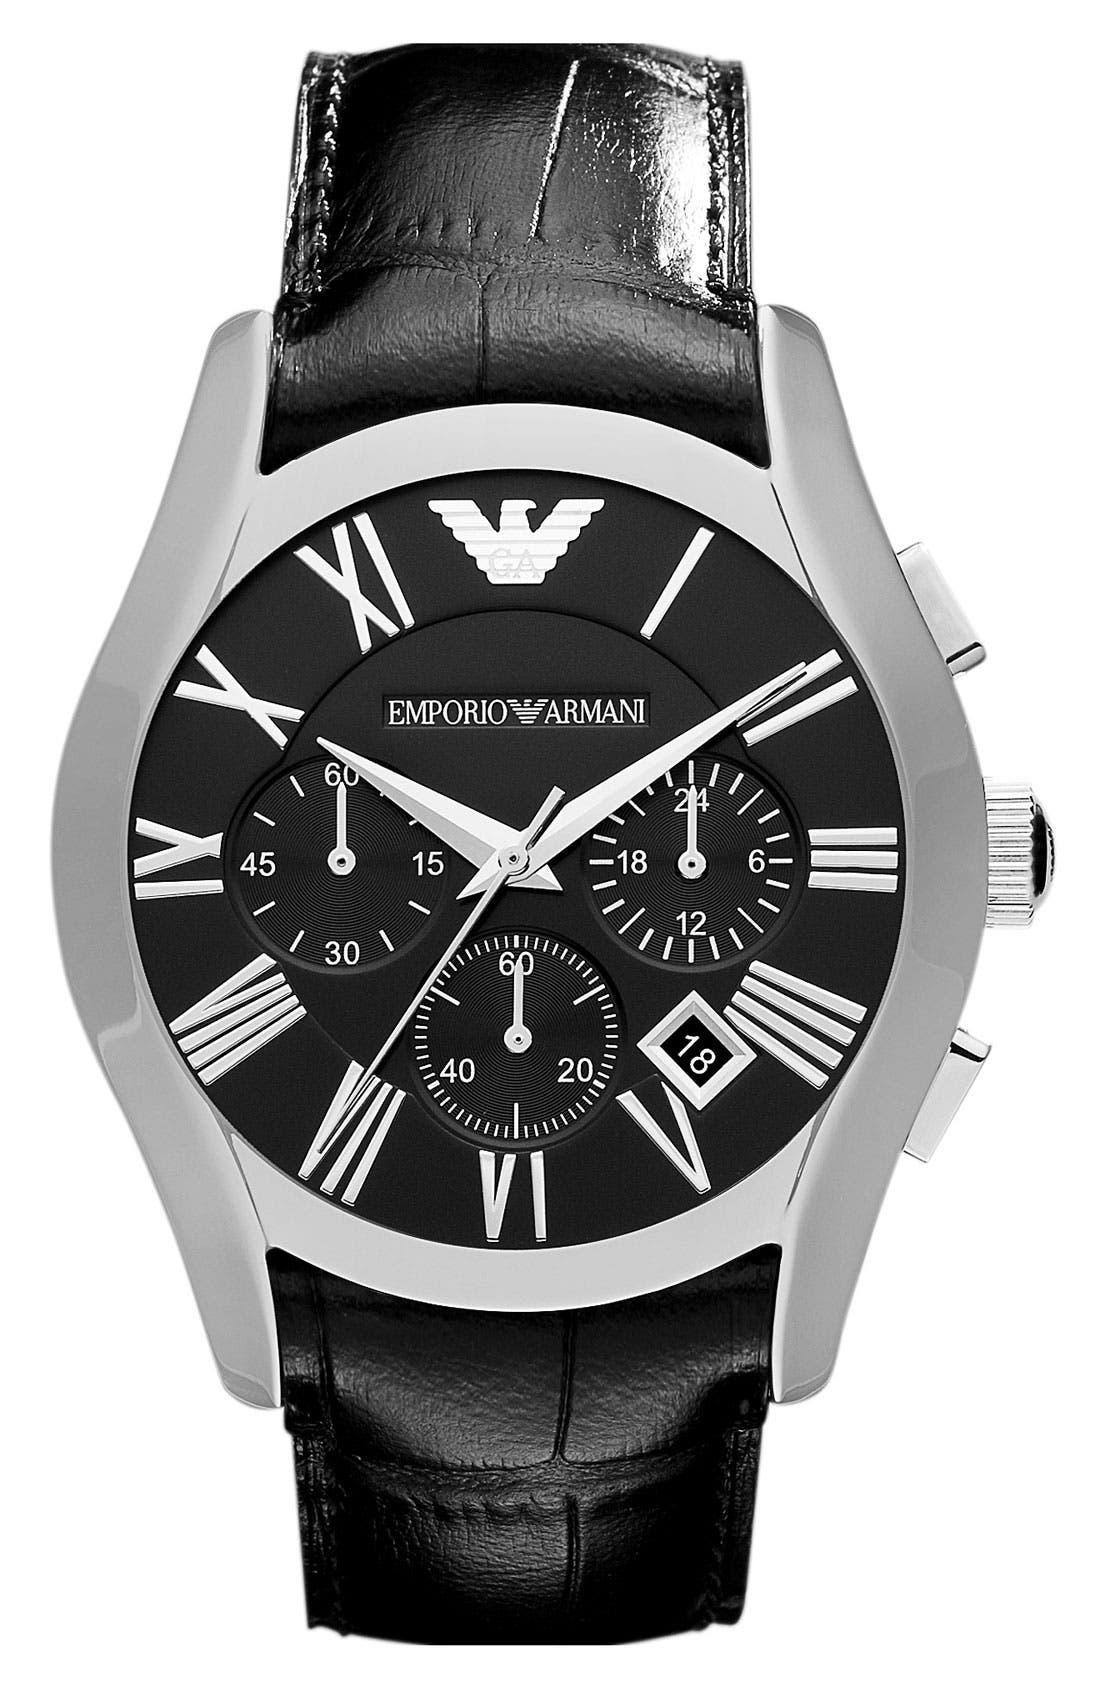 Main Image - Emporio Armani 'Classic' Round Chronograph Watch